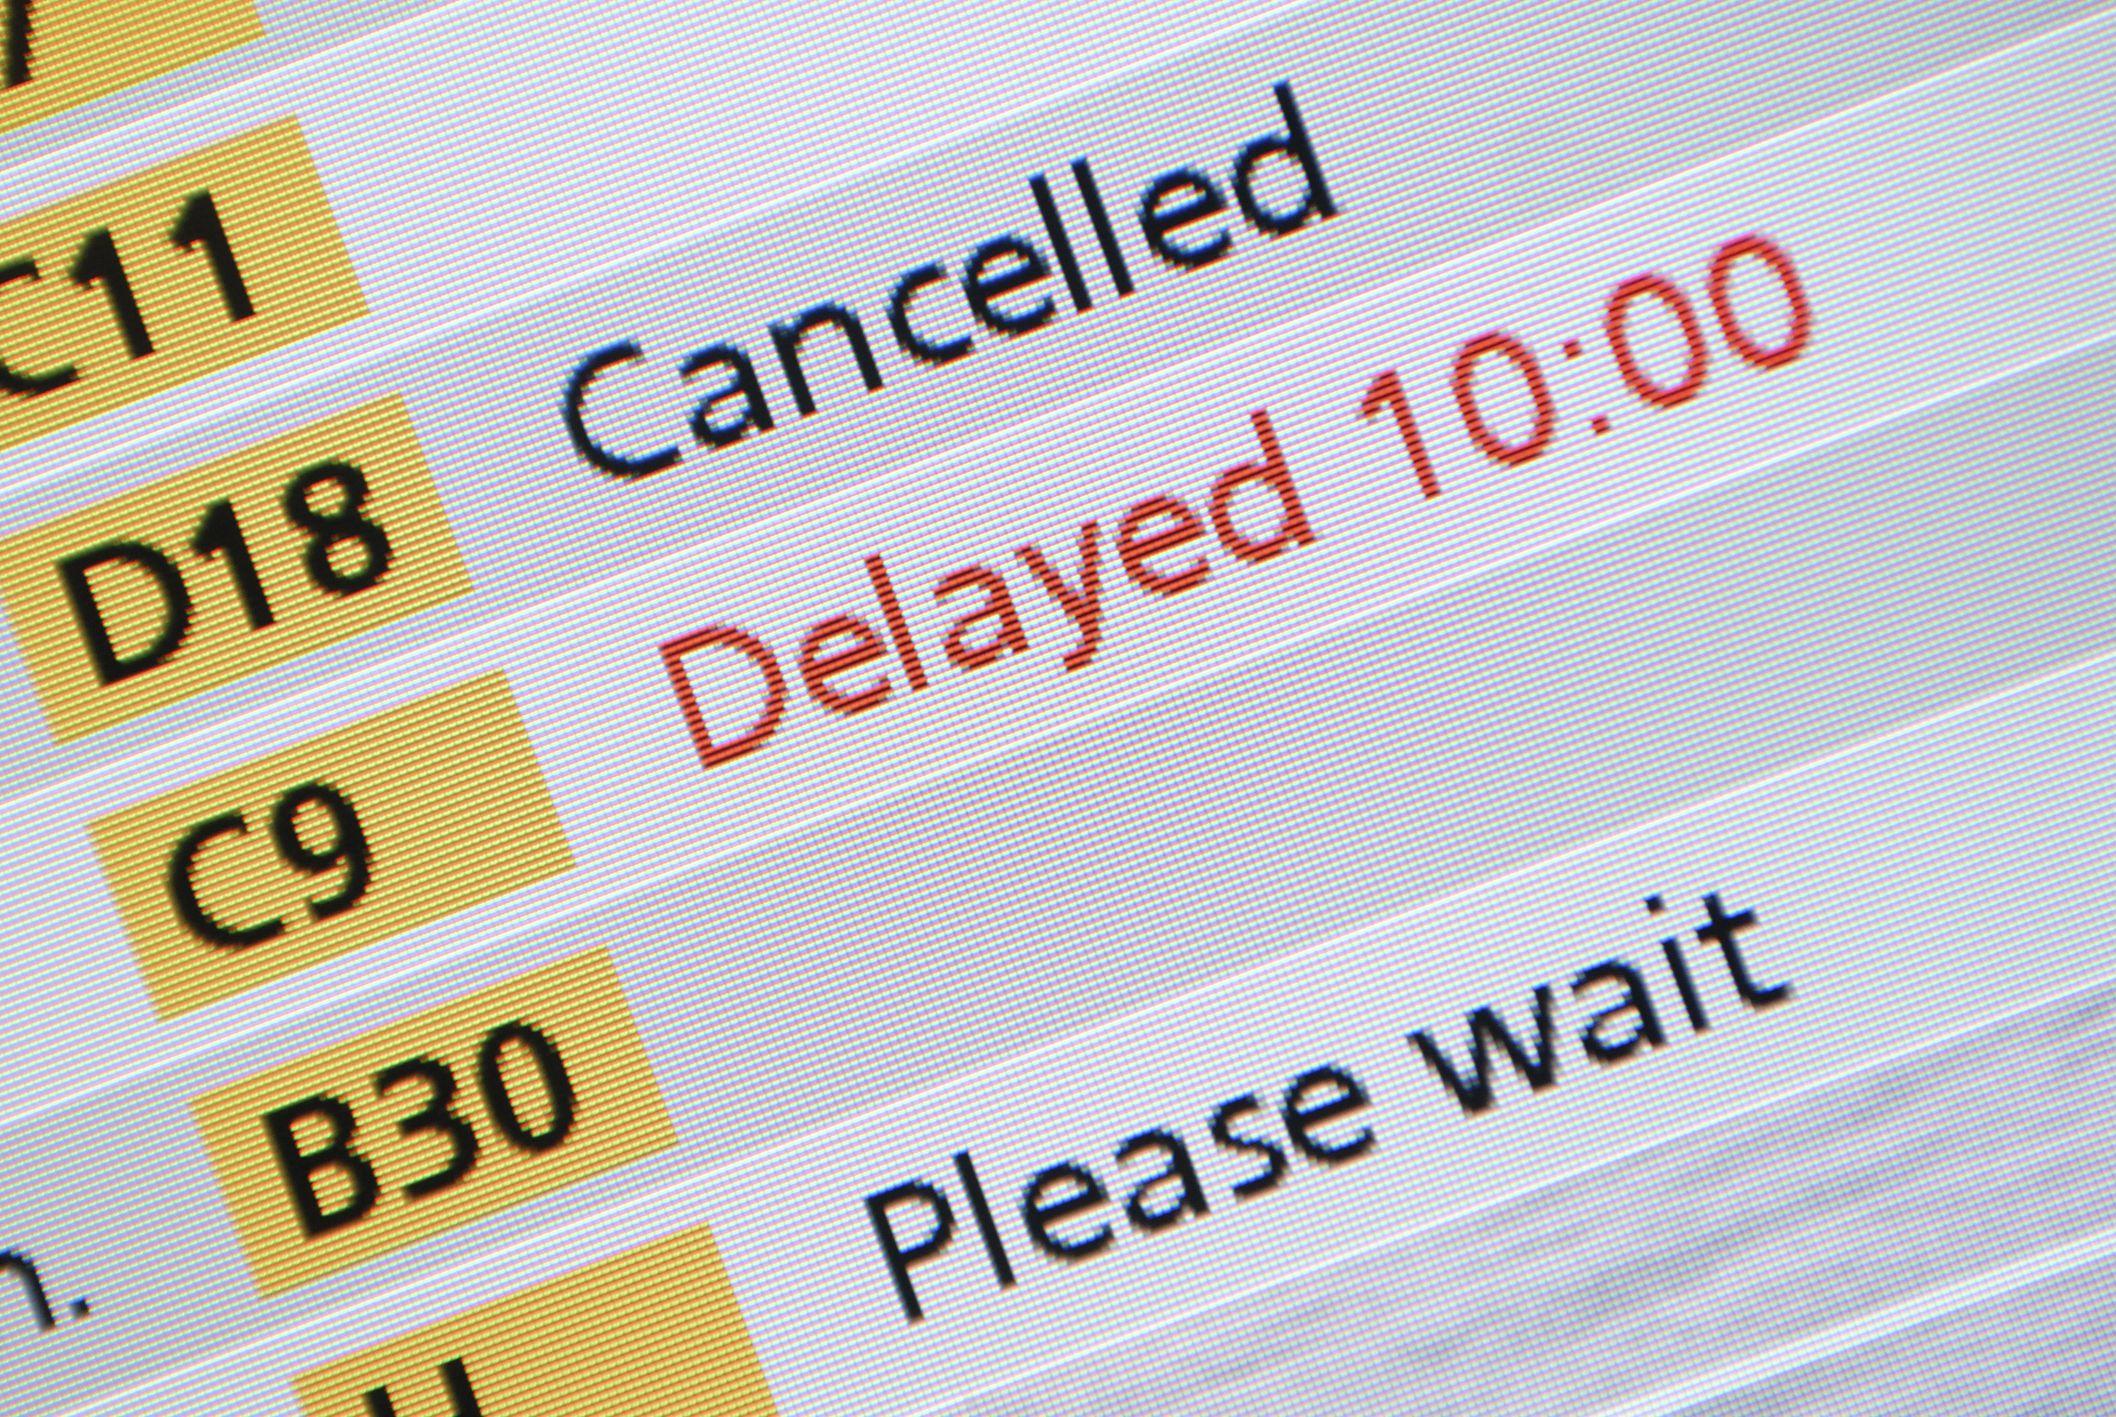 Flight departure board, Schiphol Airport, Amsterdam